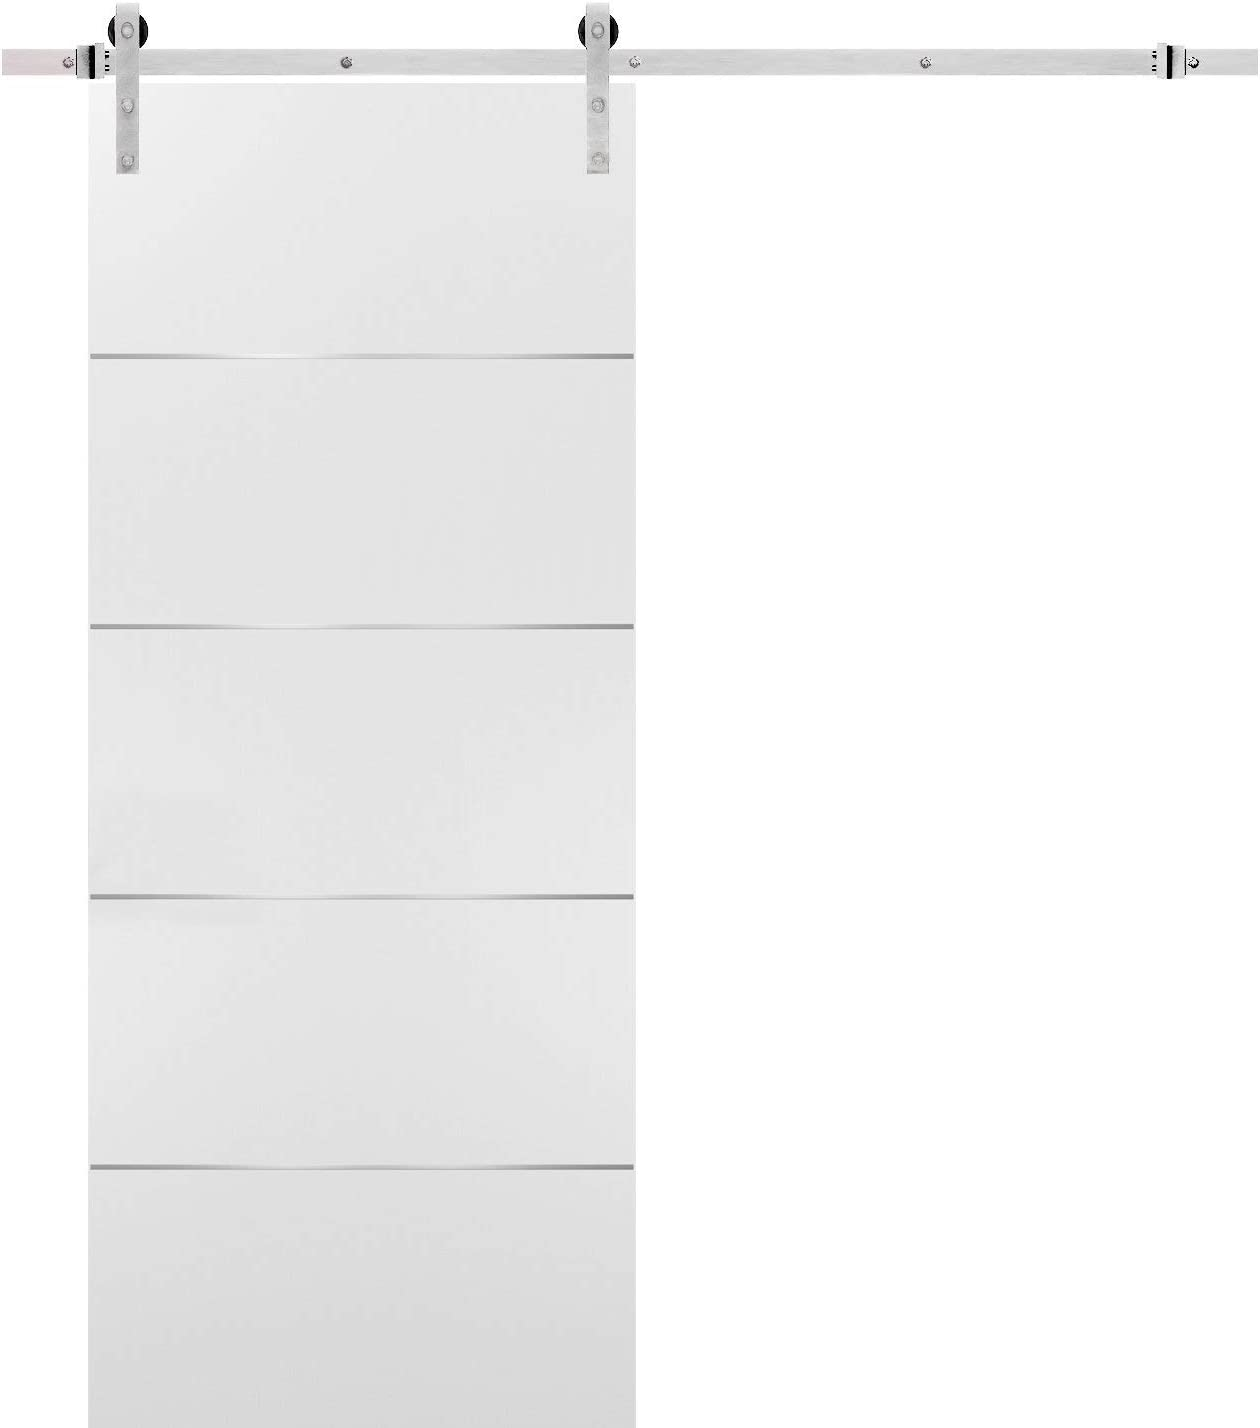 Barn Sliding White Door 32x80 with Stainless Steel Hardware   Planum 0020 Matte White   Rail 6.6FT Hangers Silver Set   Closet Modern Solid Core Door